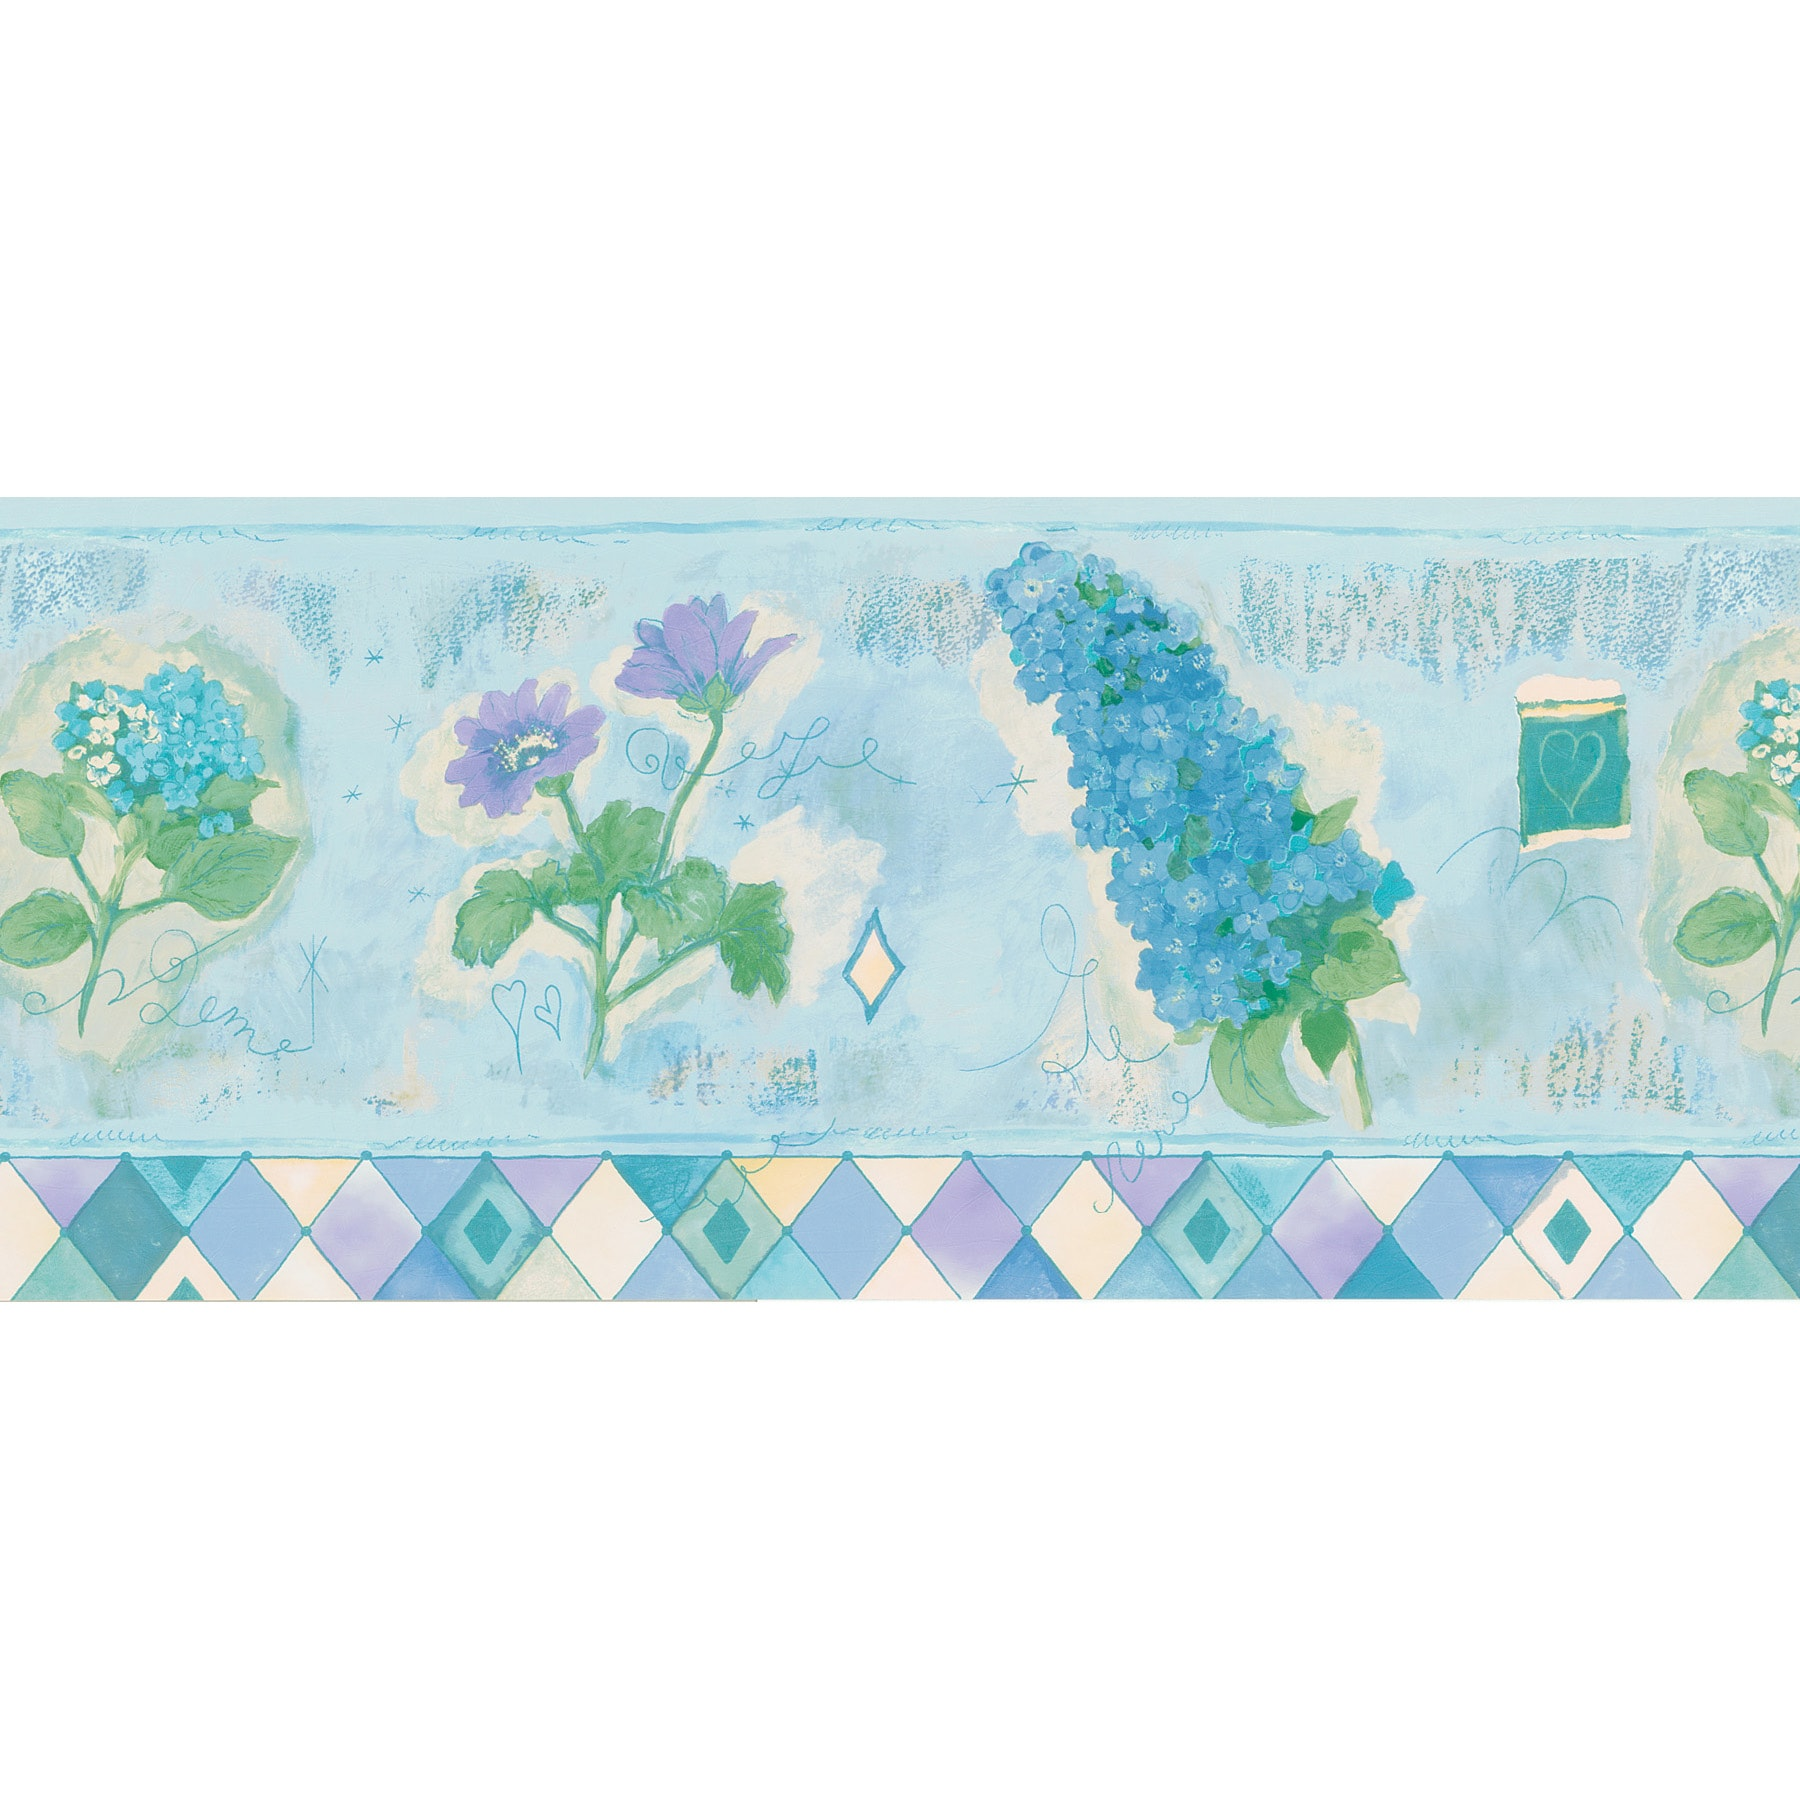 Shop Brewster Light Blue Watercolor Floral Wallpaper Border